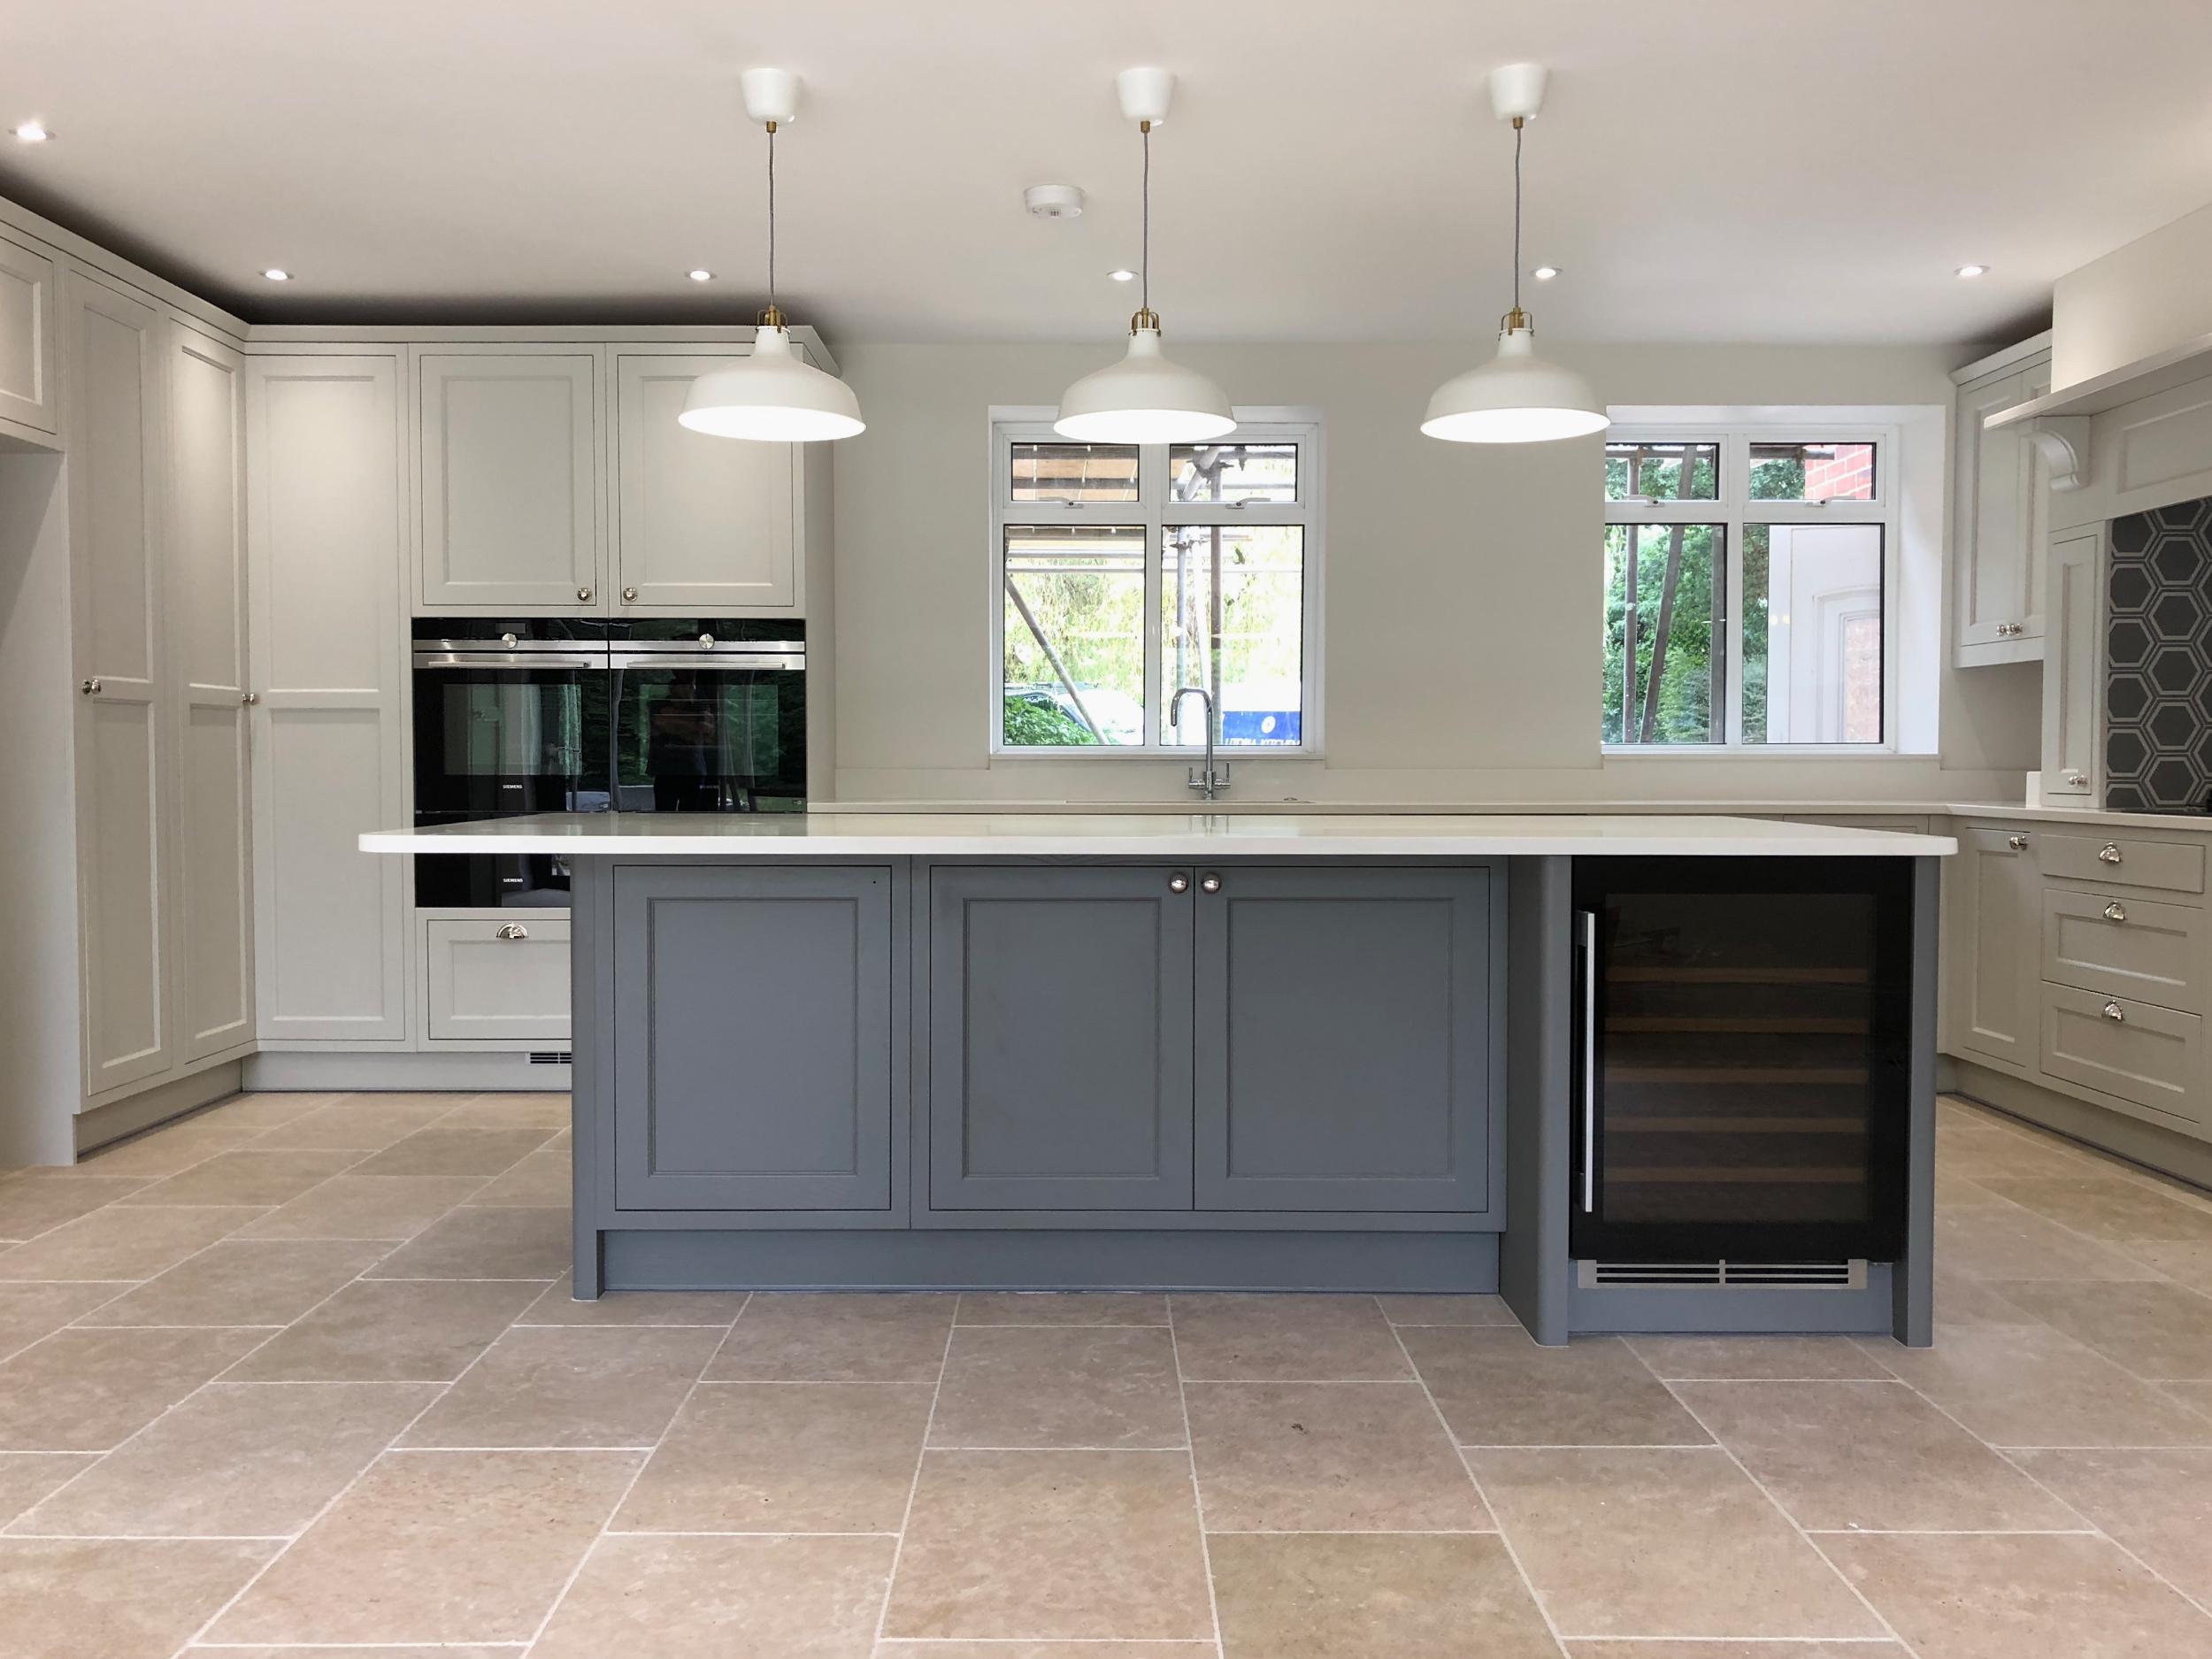 White Grey Shaker Wood Kitchen Oxfordshire 977.jpg